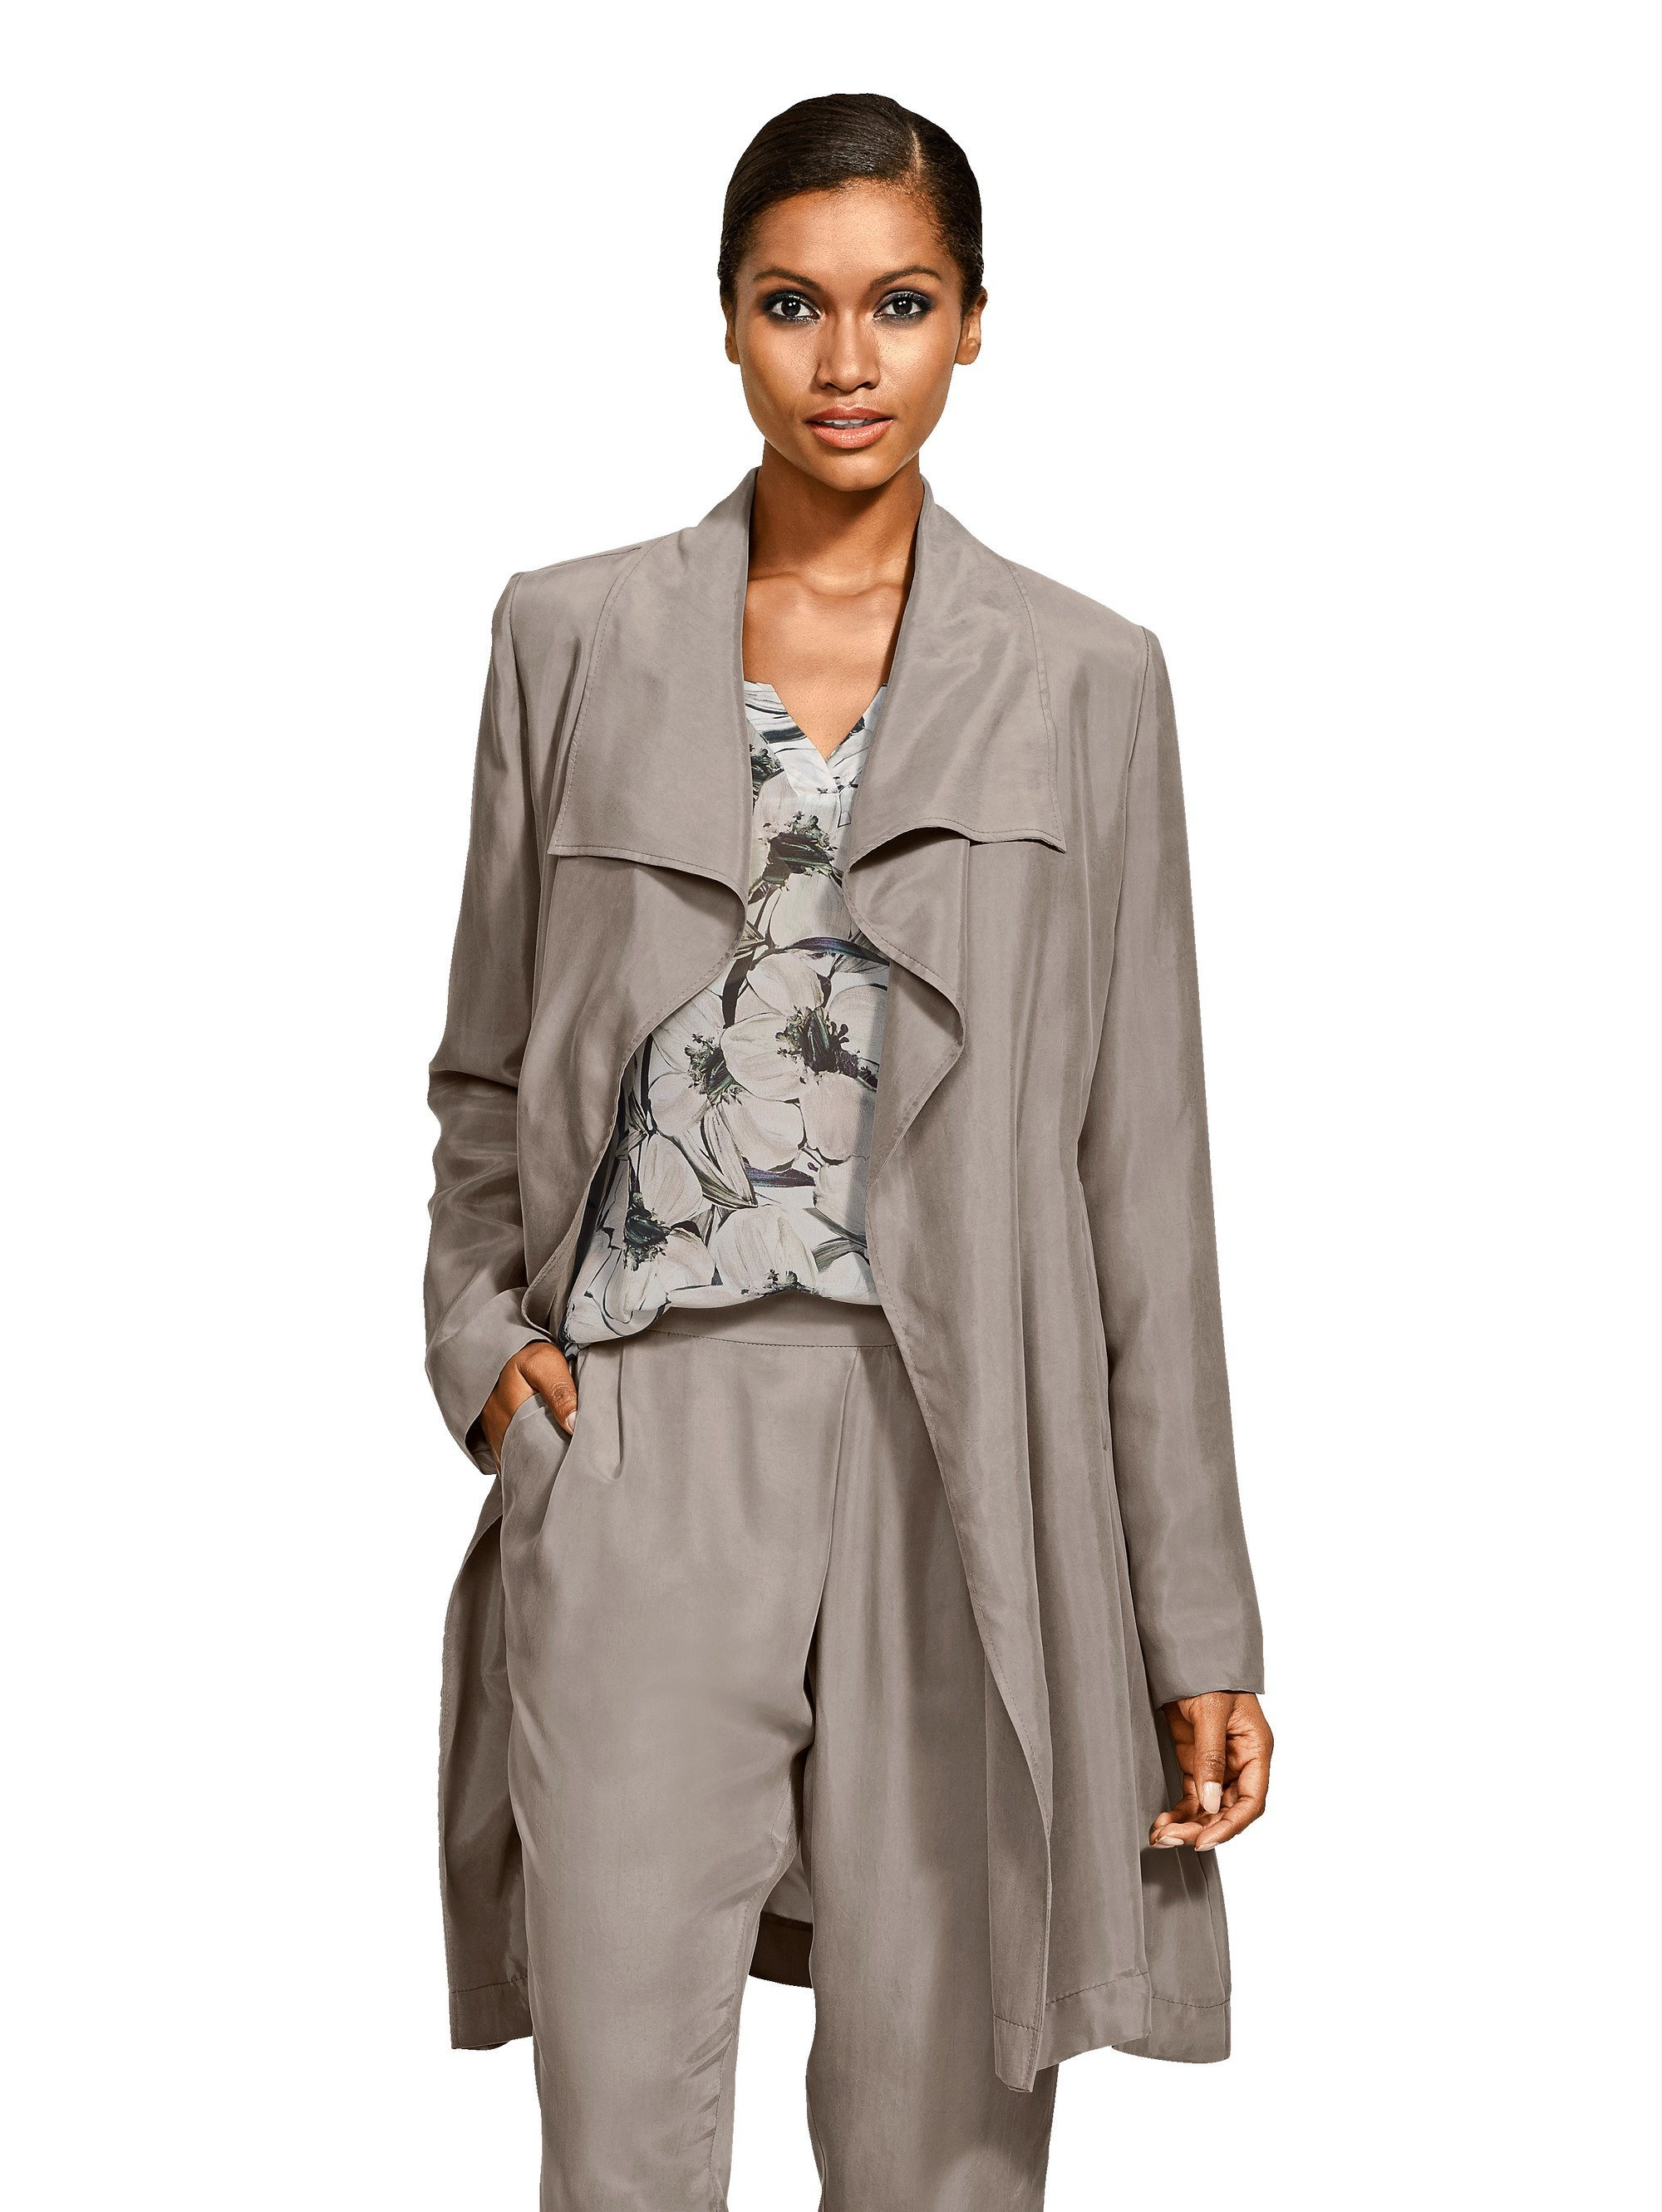 Alba Moda Trenchcoat aus hochwertiger Cupro-Qualität | Bekleidung > Mäntel > Trenchcoats | Cupro | Alba Moda